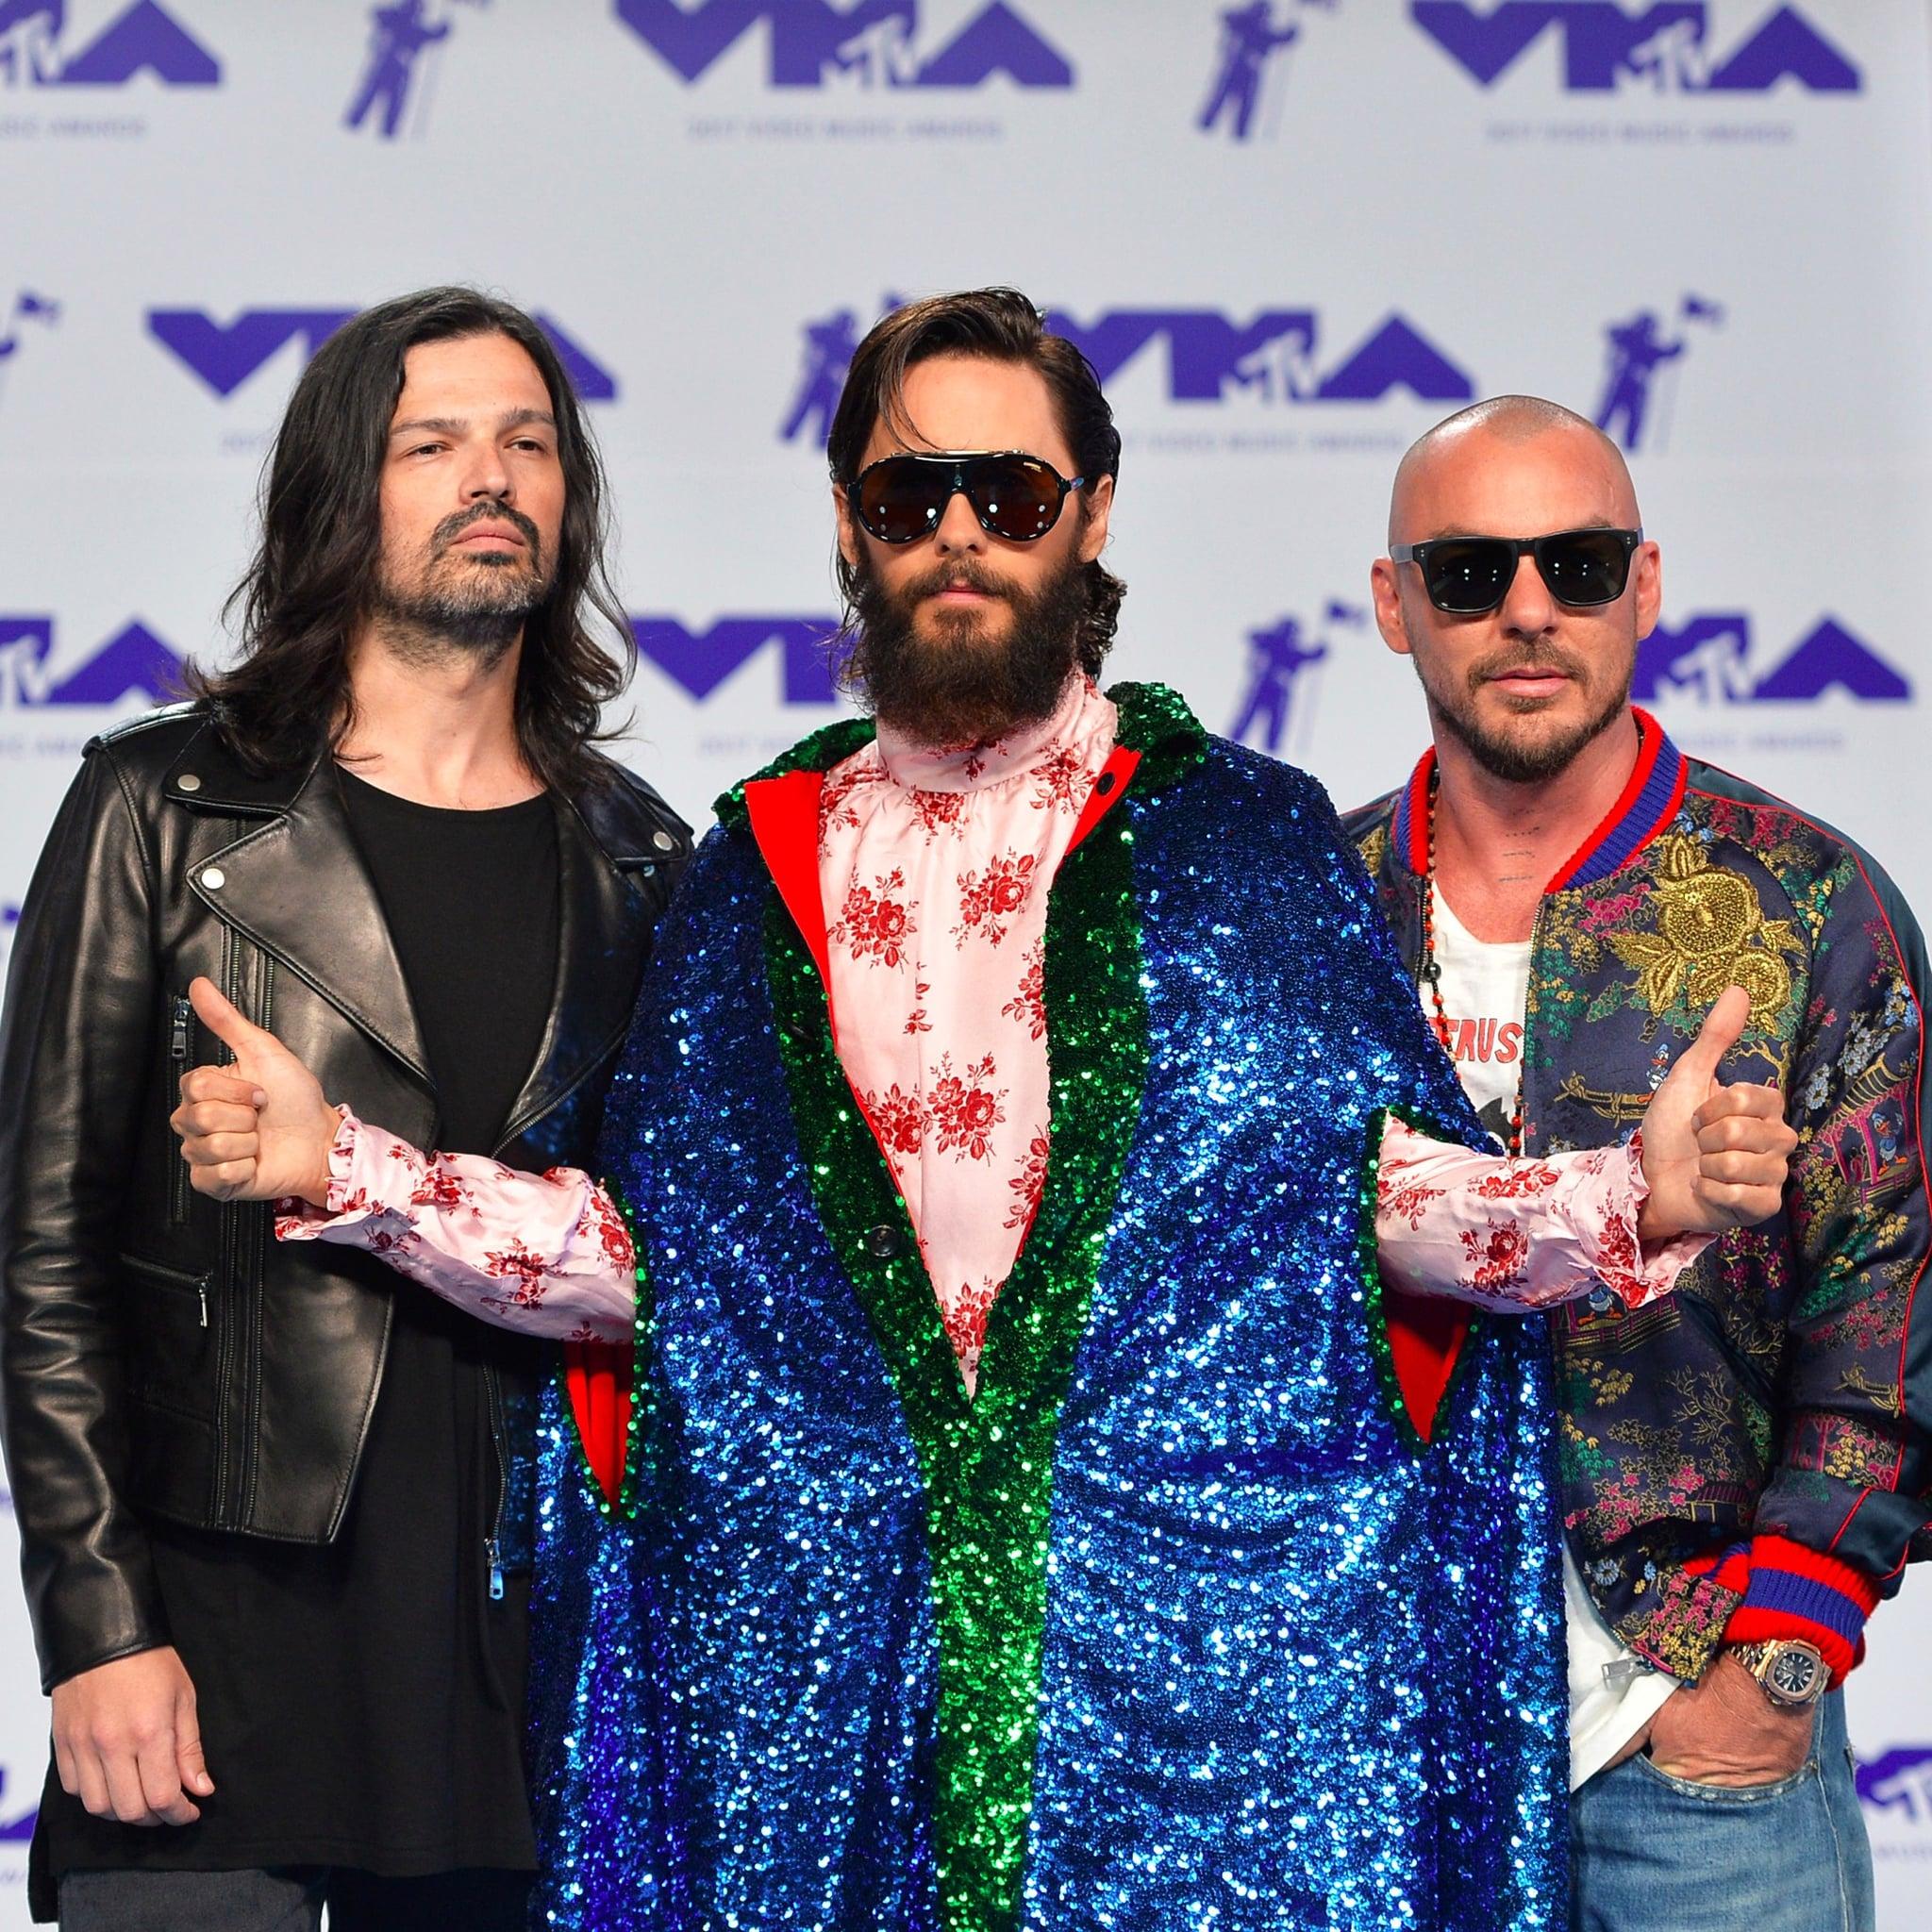 Jared leto popsugar au 30 seconds to mars mtv vmas 2017 performance m4hsunfo